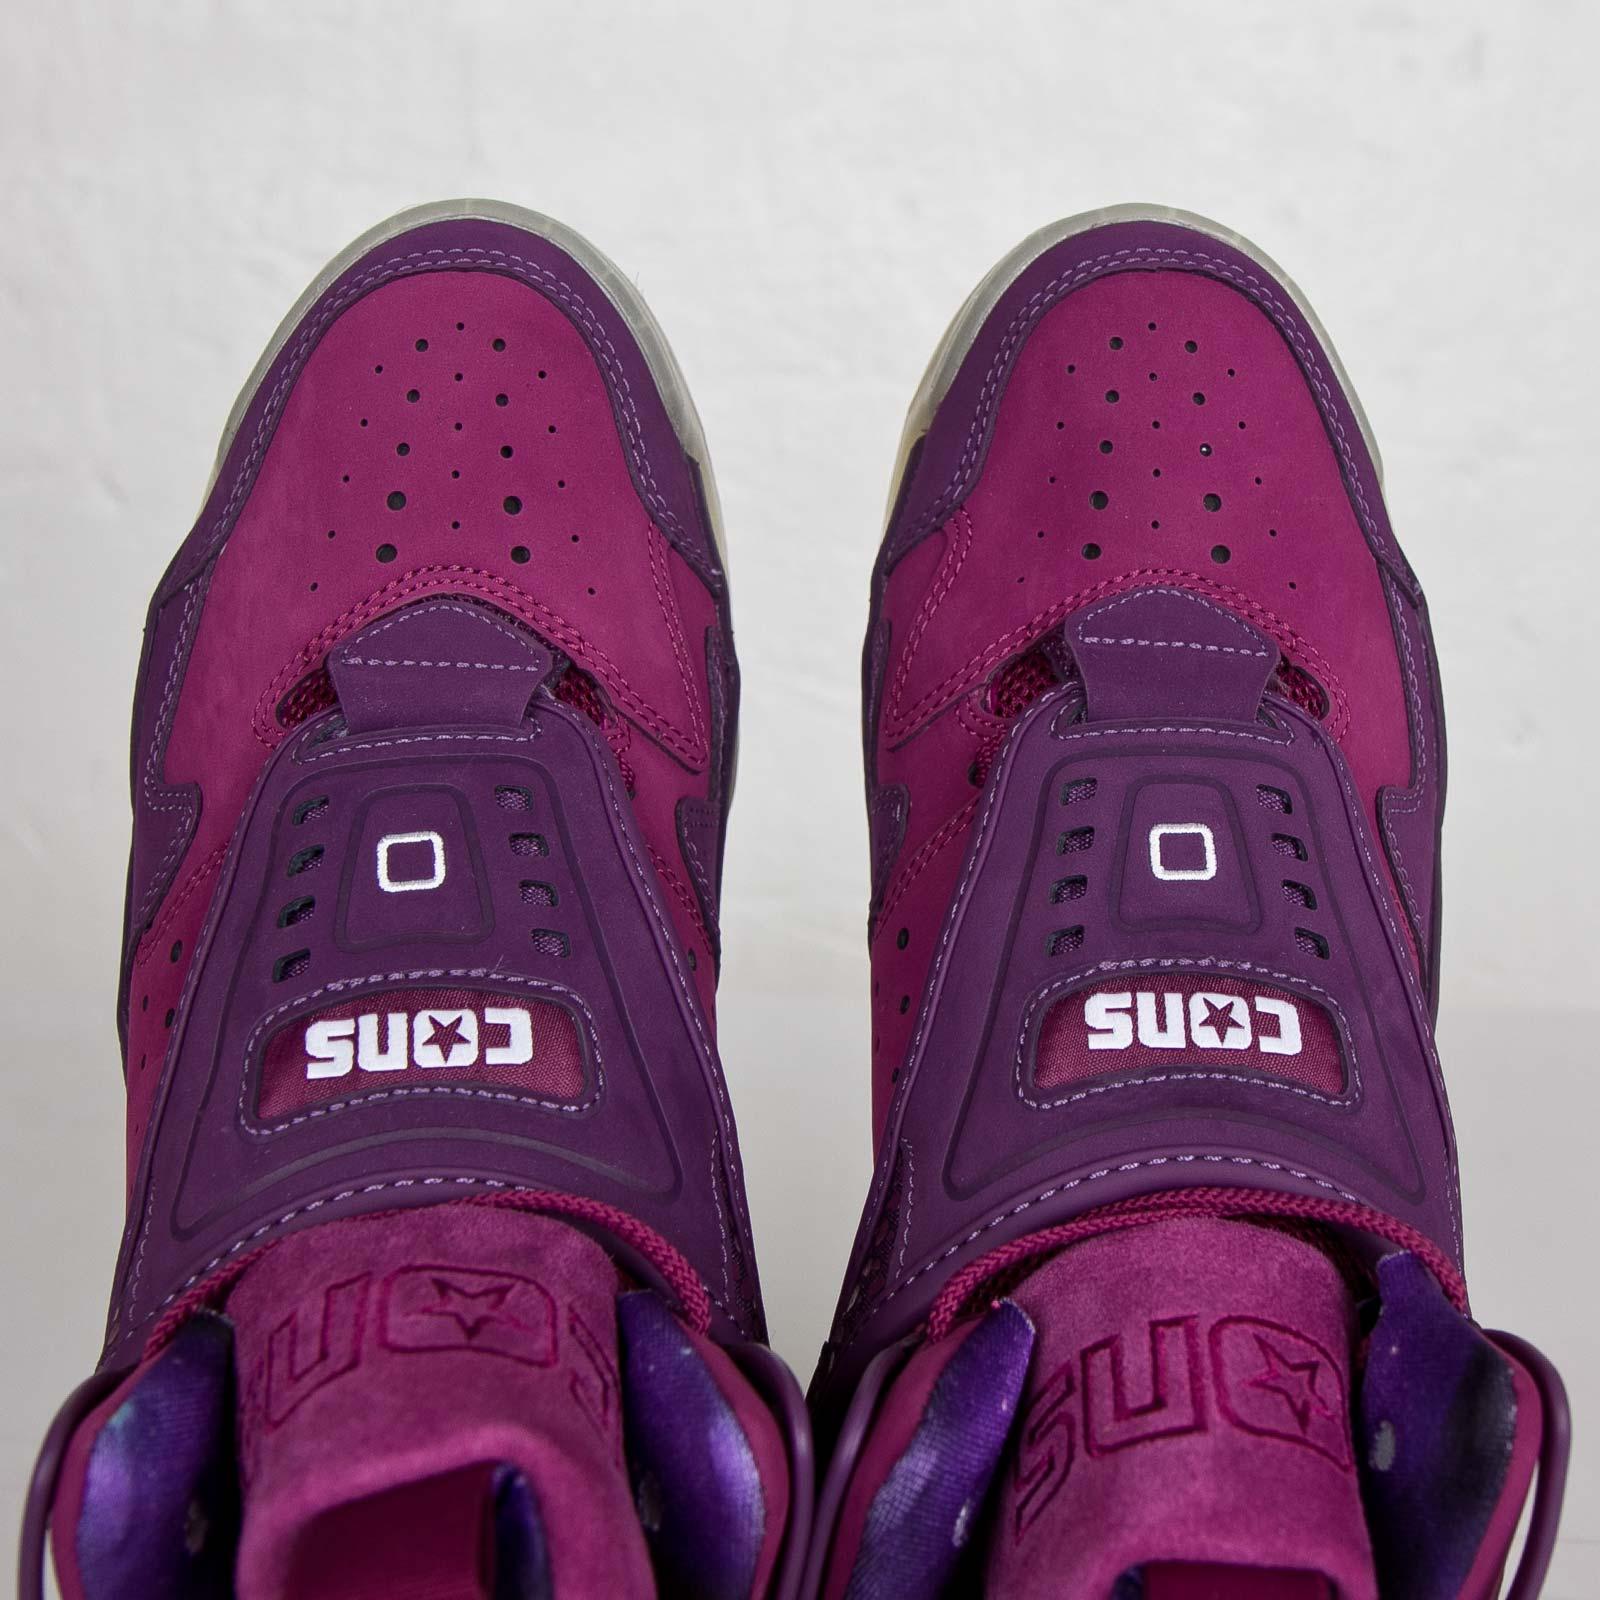 9560a903338f4d Converse Aero Jam Invader Mid - 146707c - Sneakersnstuff